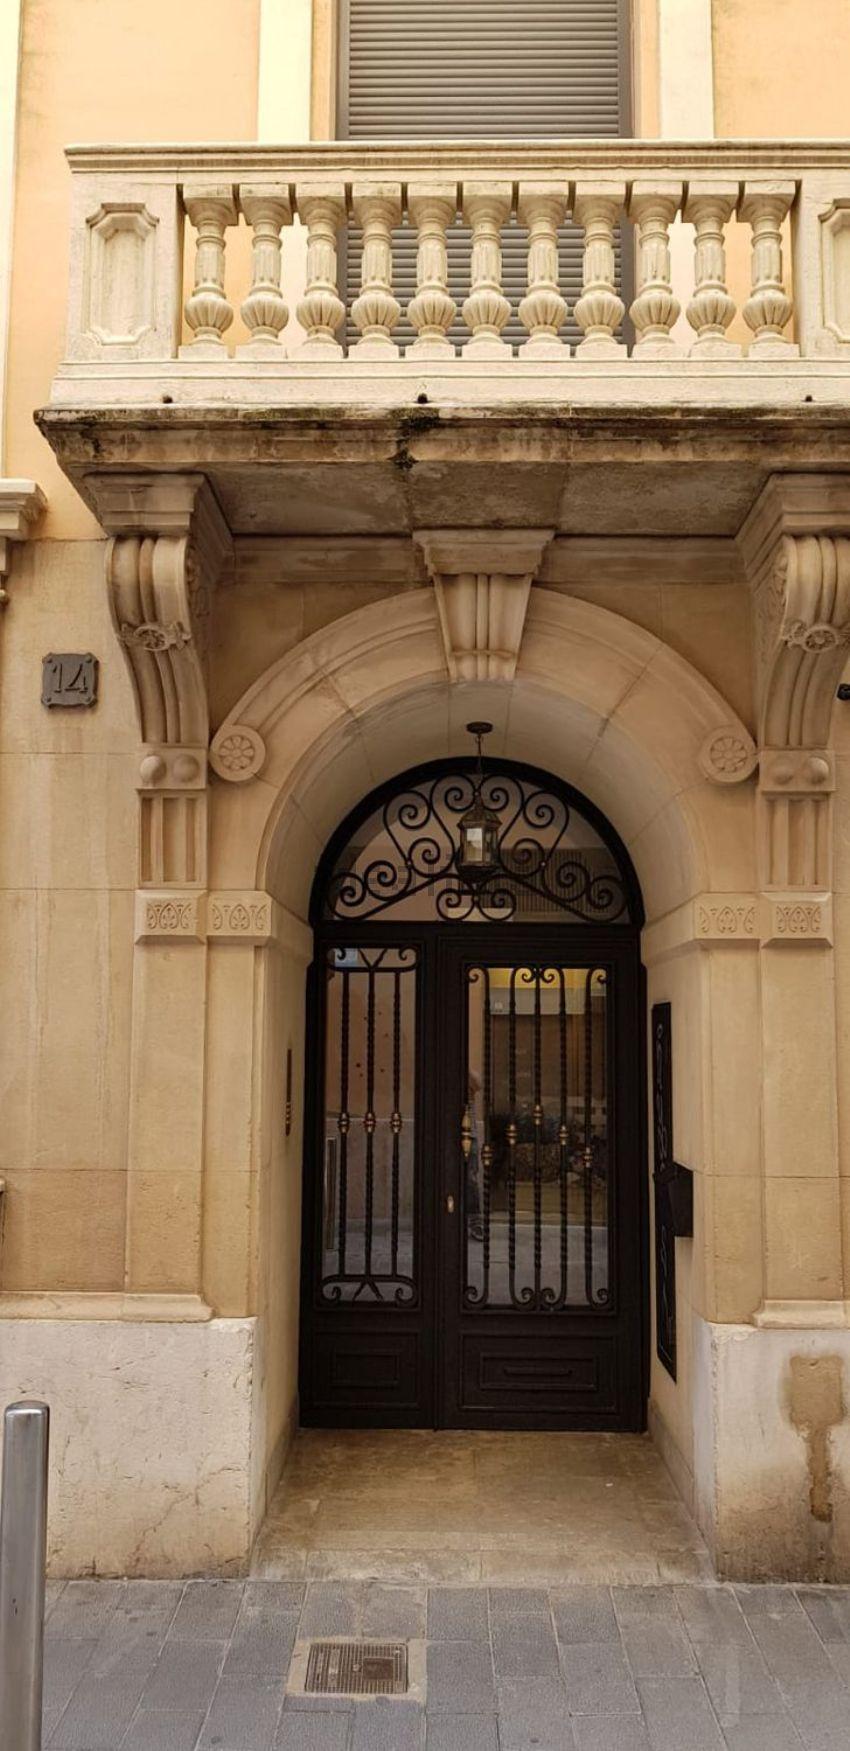 Piso en calle del Governador González, Tarragona, 15, Eixample, Tarragona